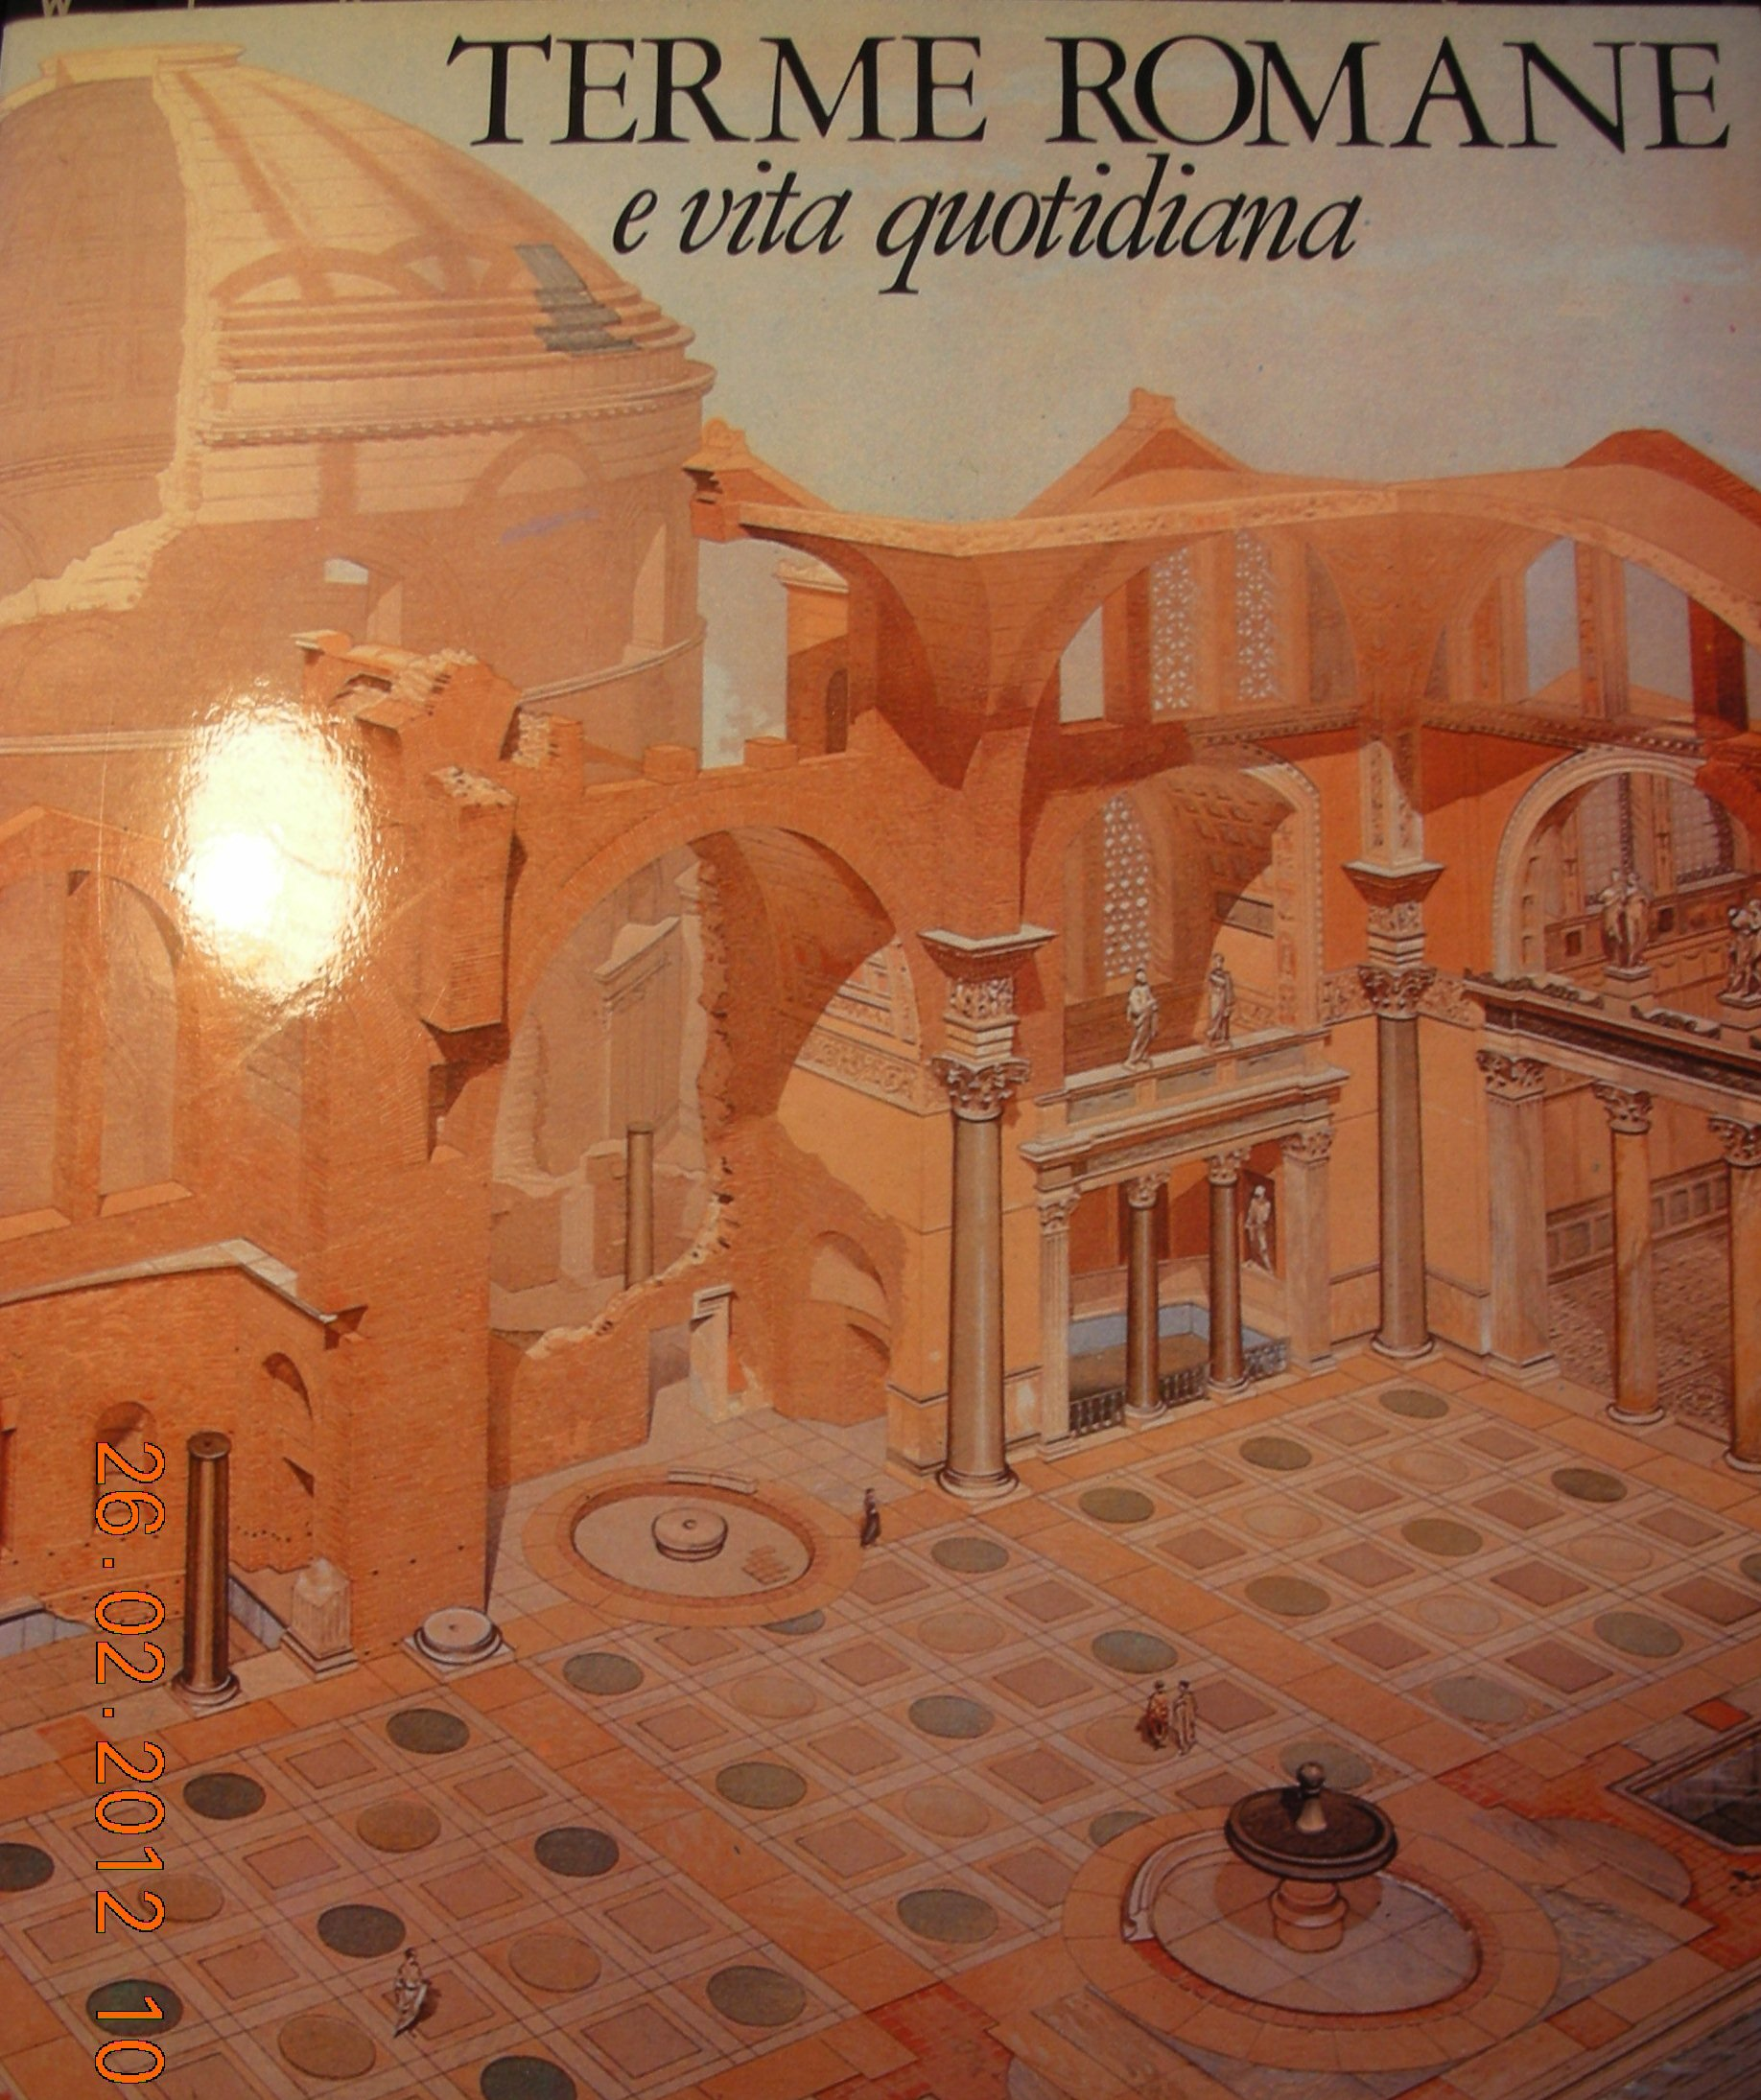 Terme romane e vita quotidiana